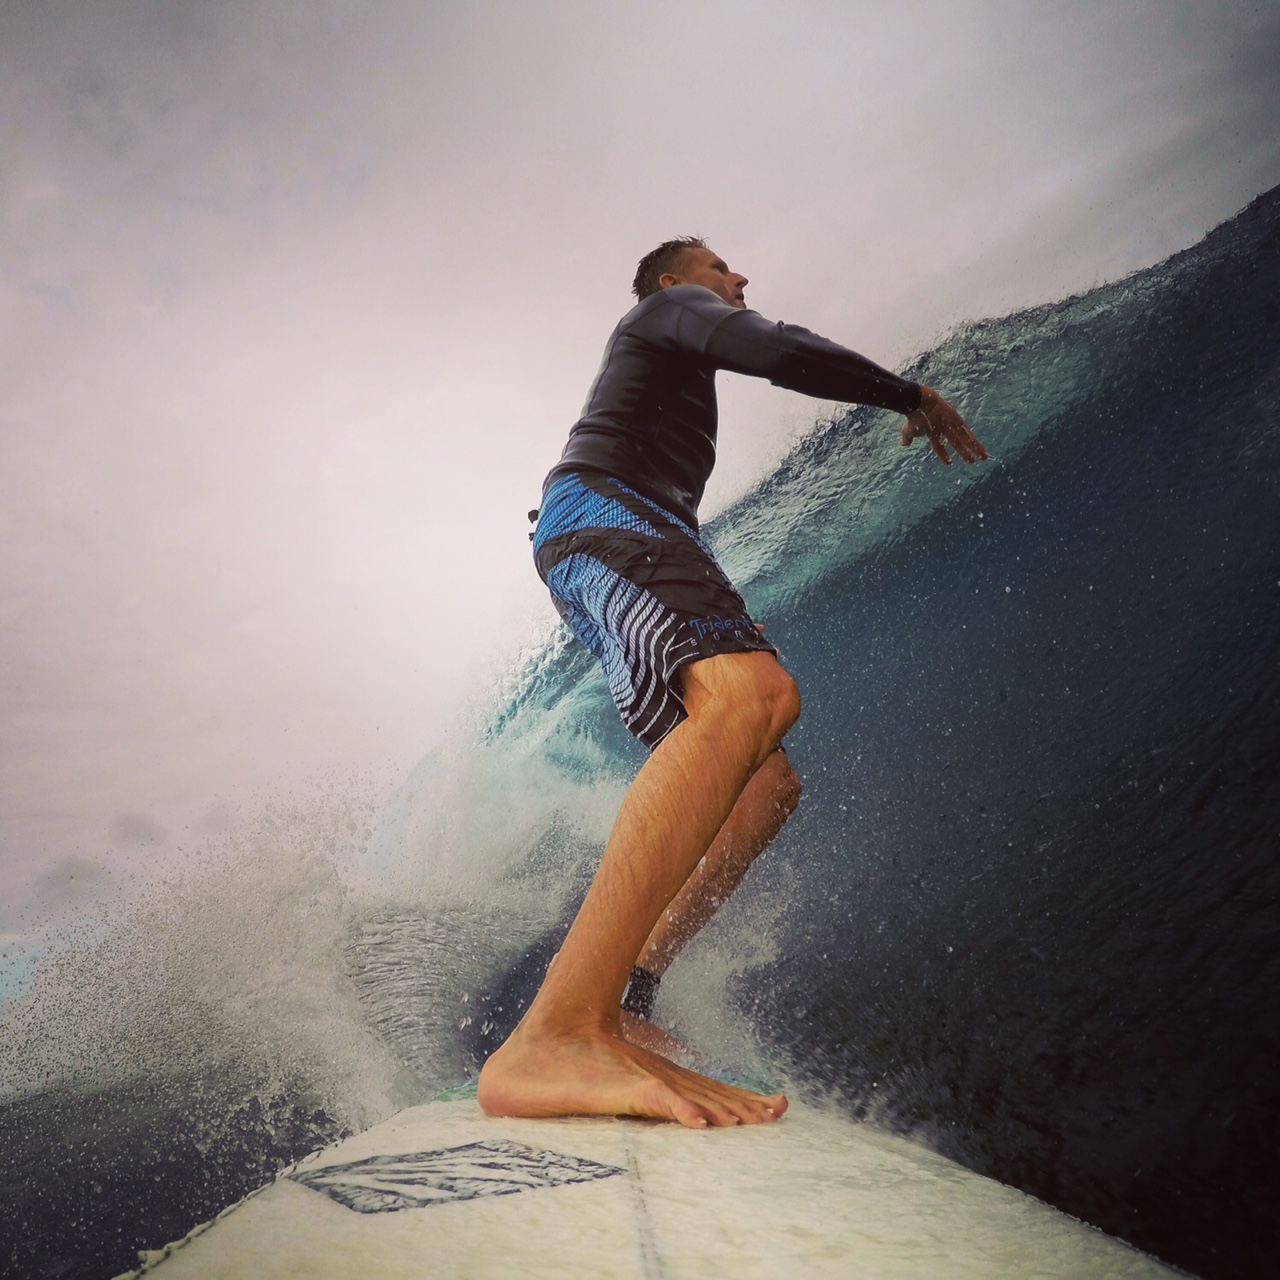 Pipes Surf Break, Viti Levu, Fiji